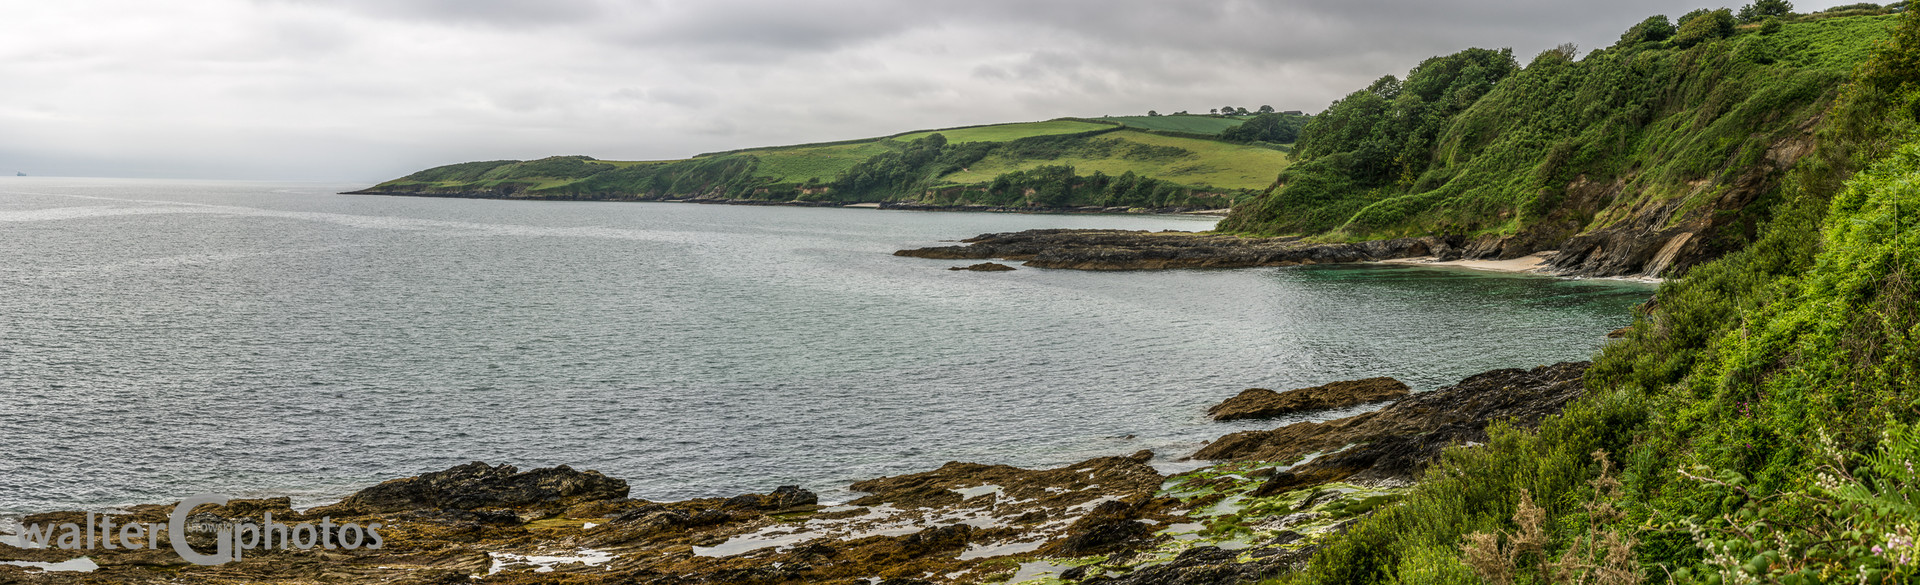 Falmouth coastline, Cornwall, England